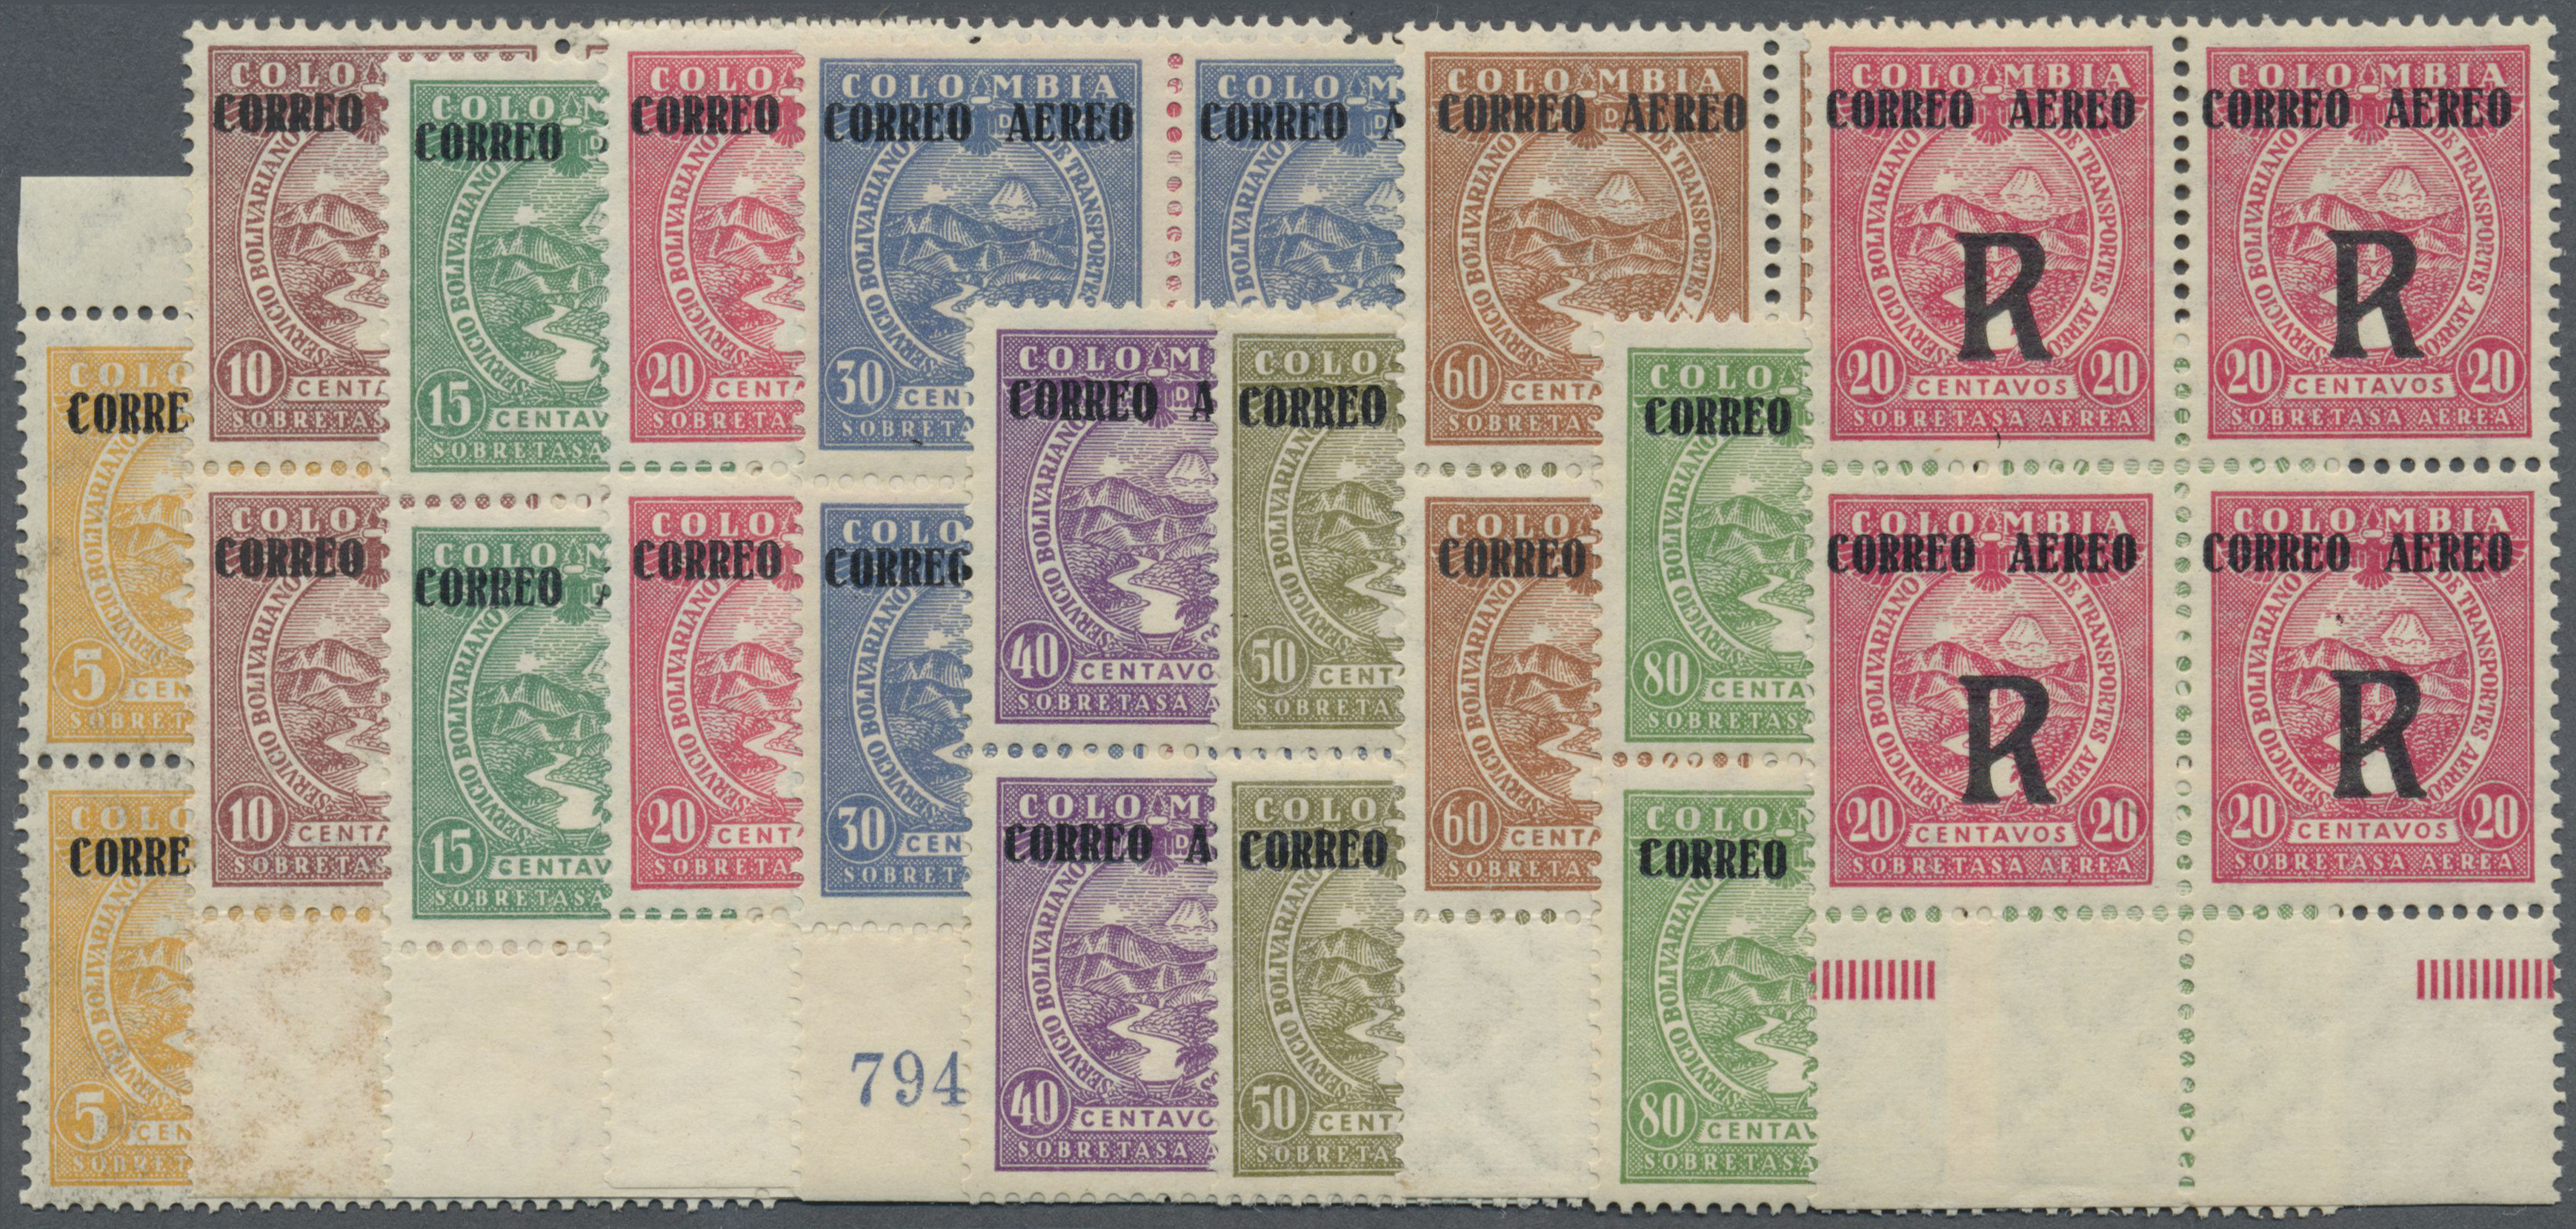 Lot 13936 - kolumbien  -  Auktionshaus Christoph Gärtner GmbH & Co. KG Single lots Philately Overseas & Europe. Auction #39 Day 4